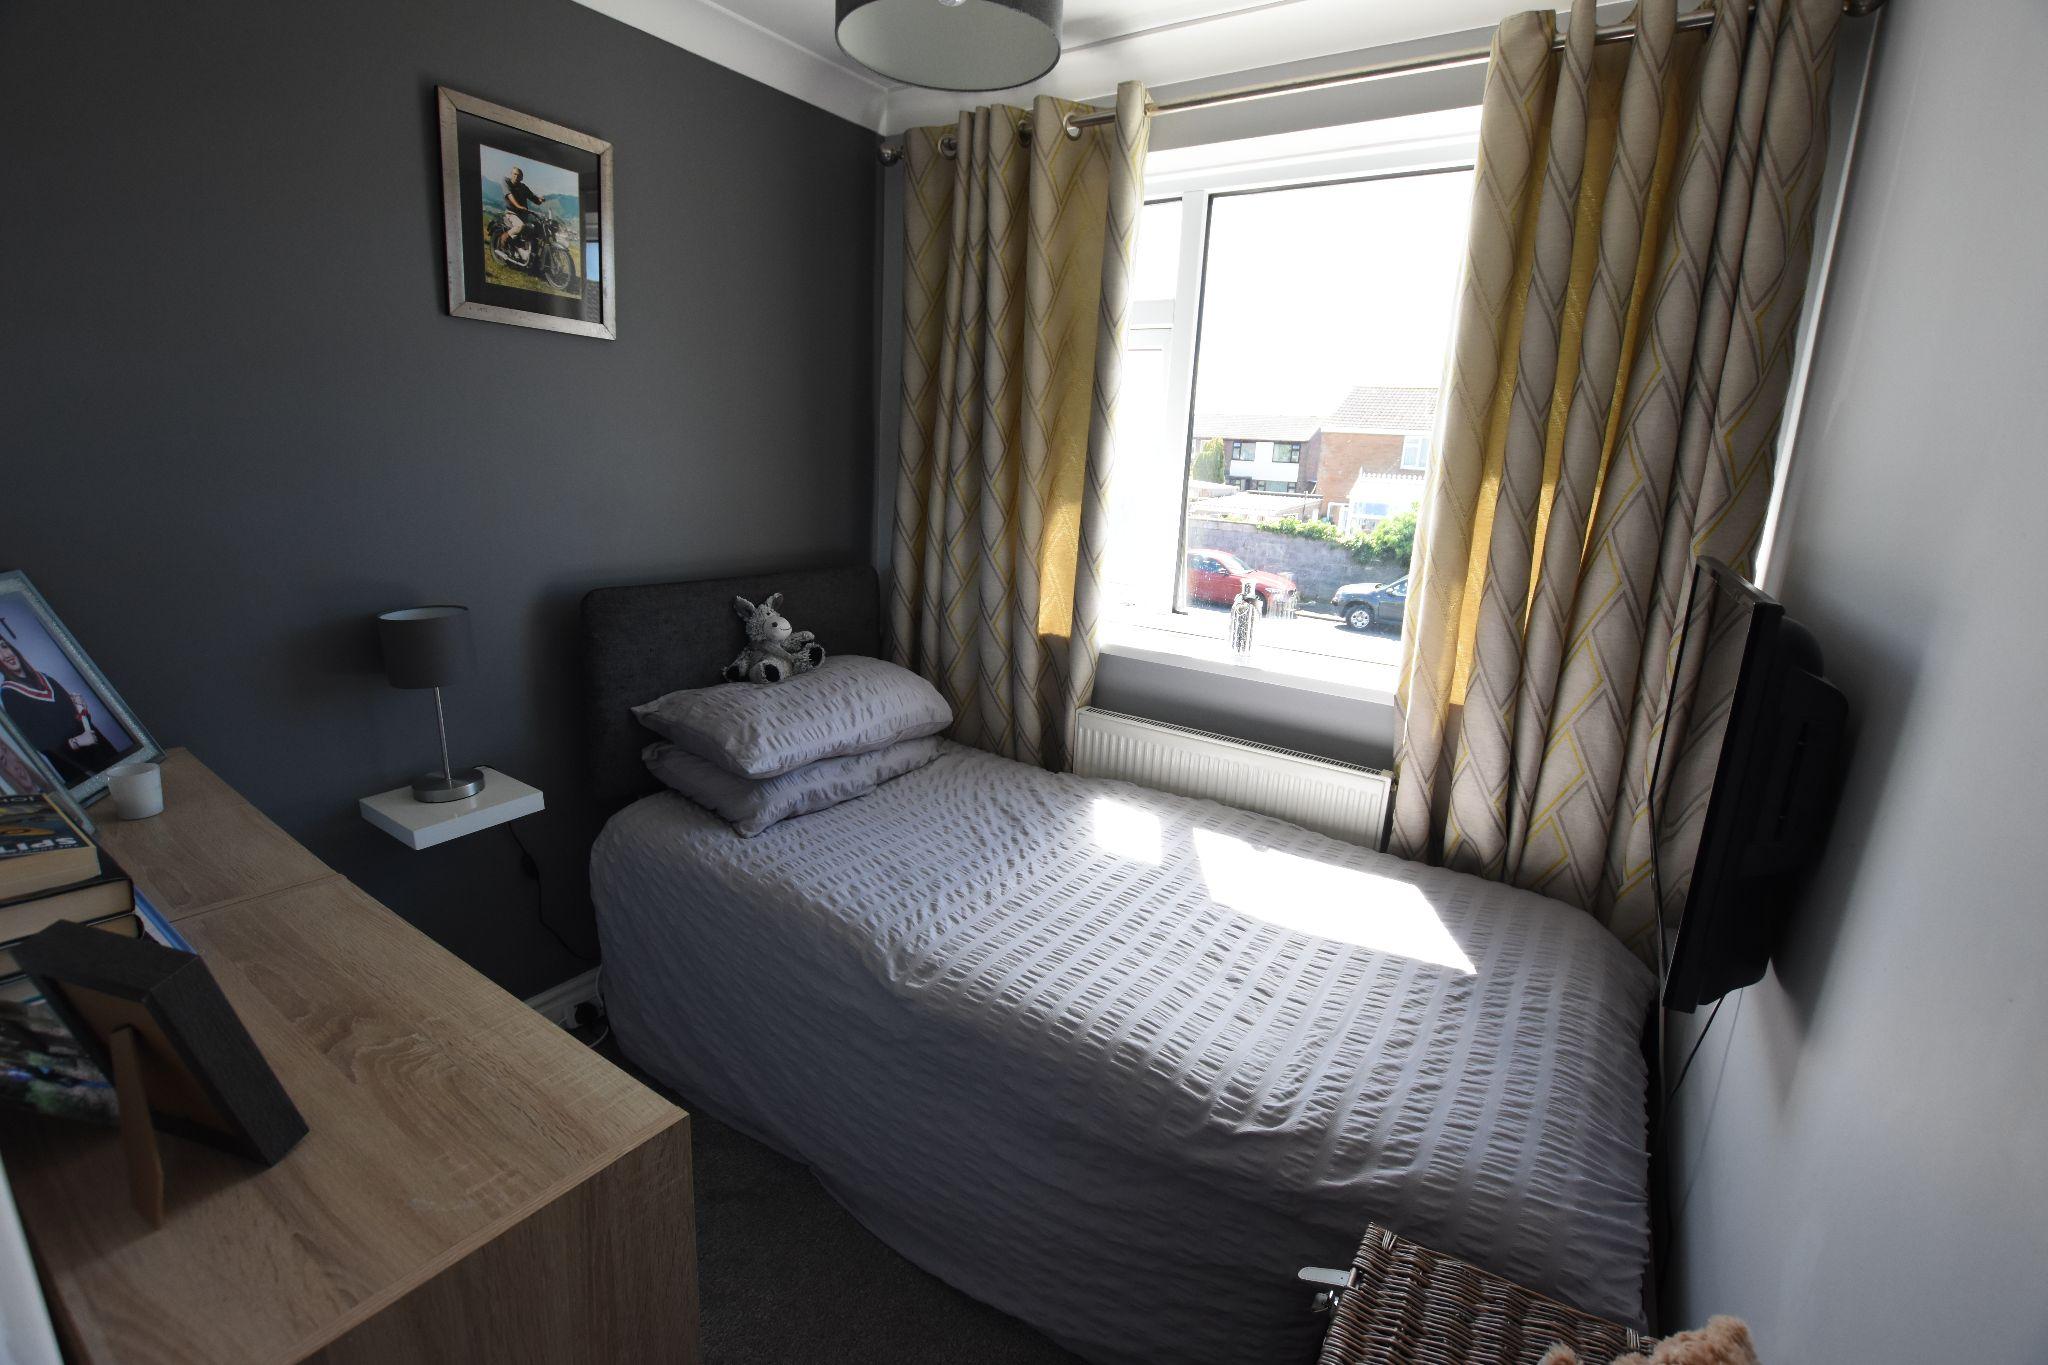 3 bedroom semi-detached house Sold STC in Preston - Bedroom 3